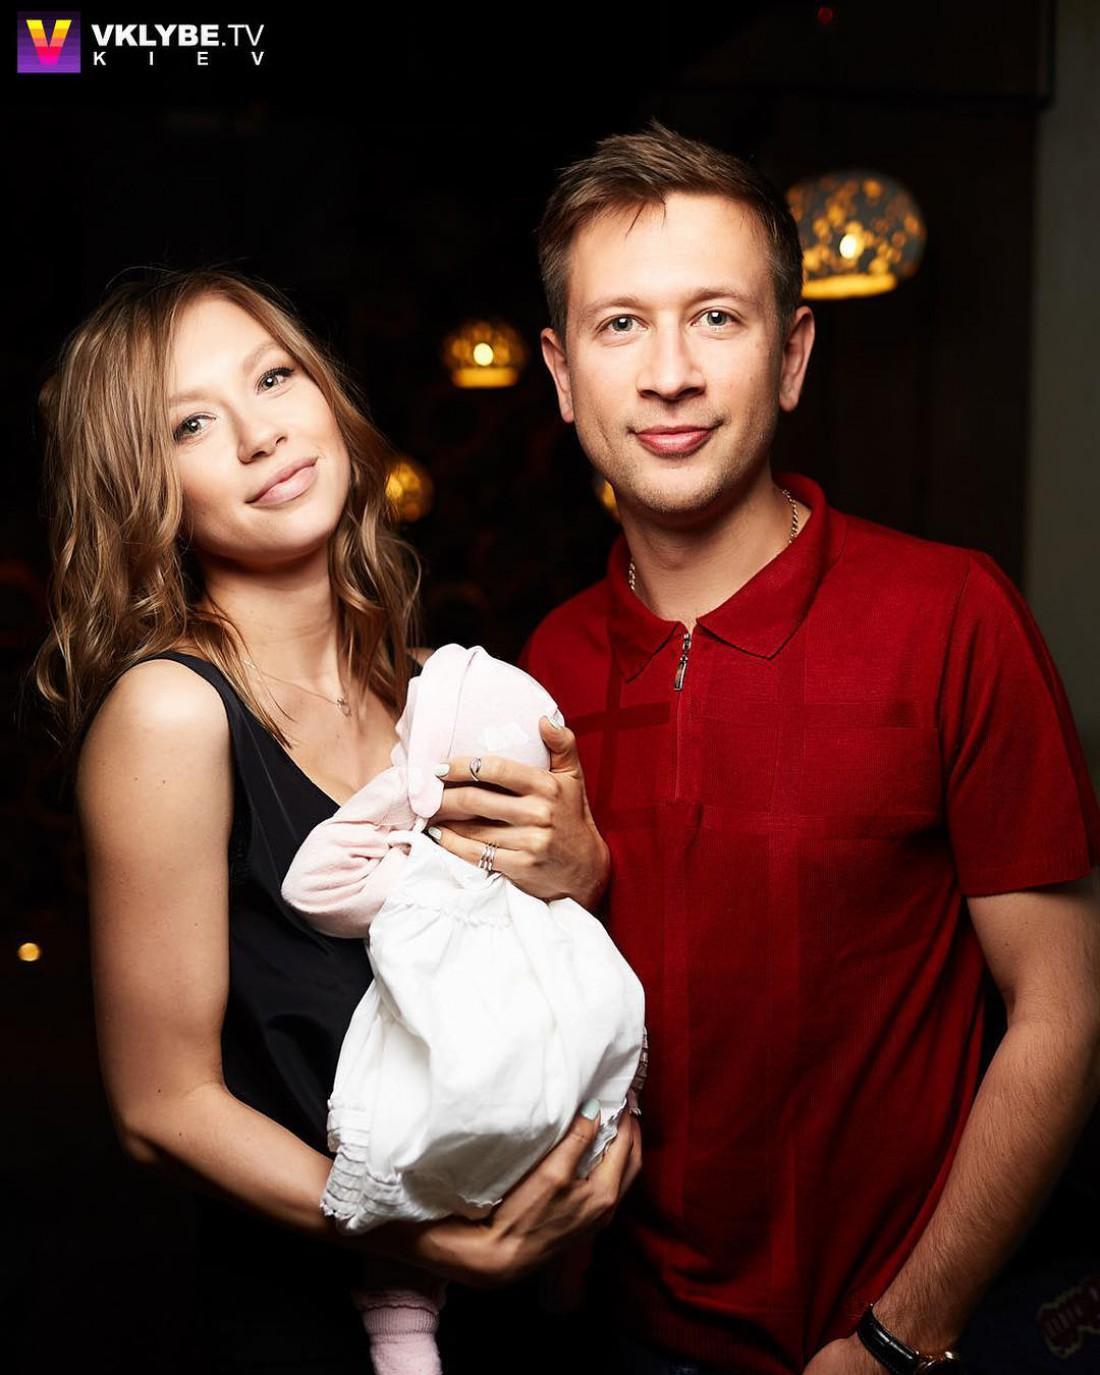 Полина Логунова и Дмитрий Ступка